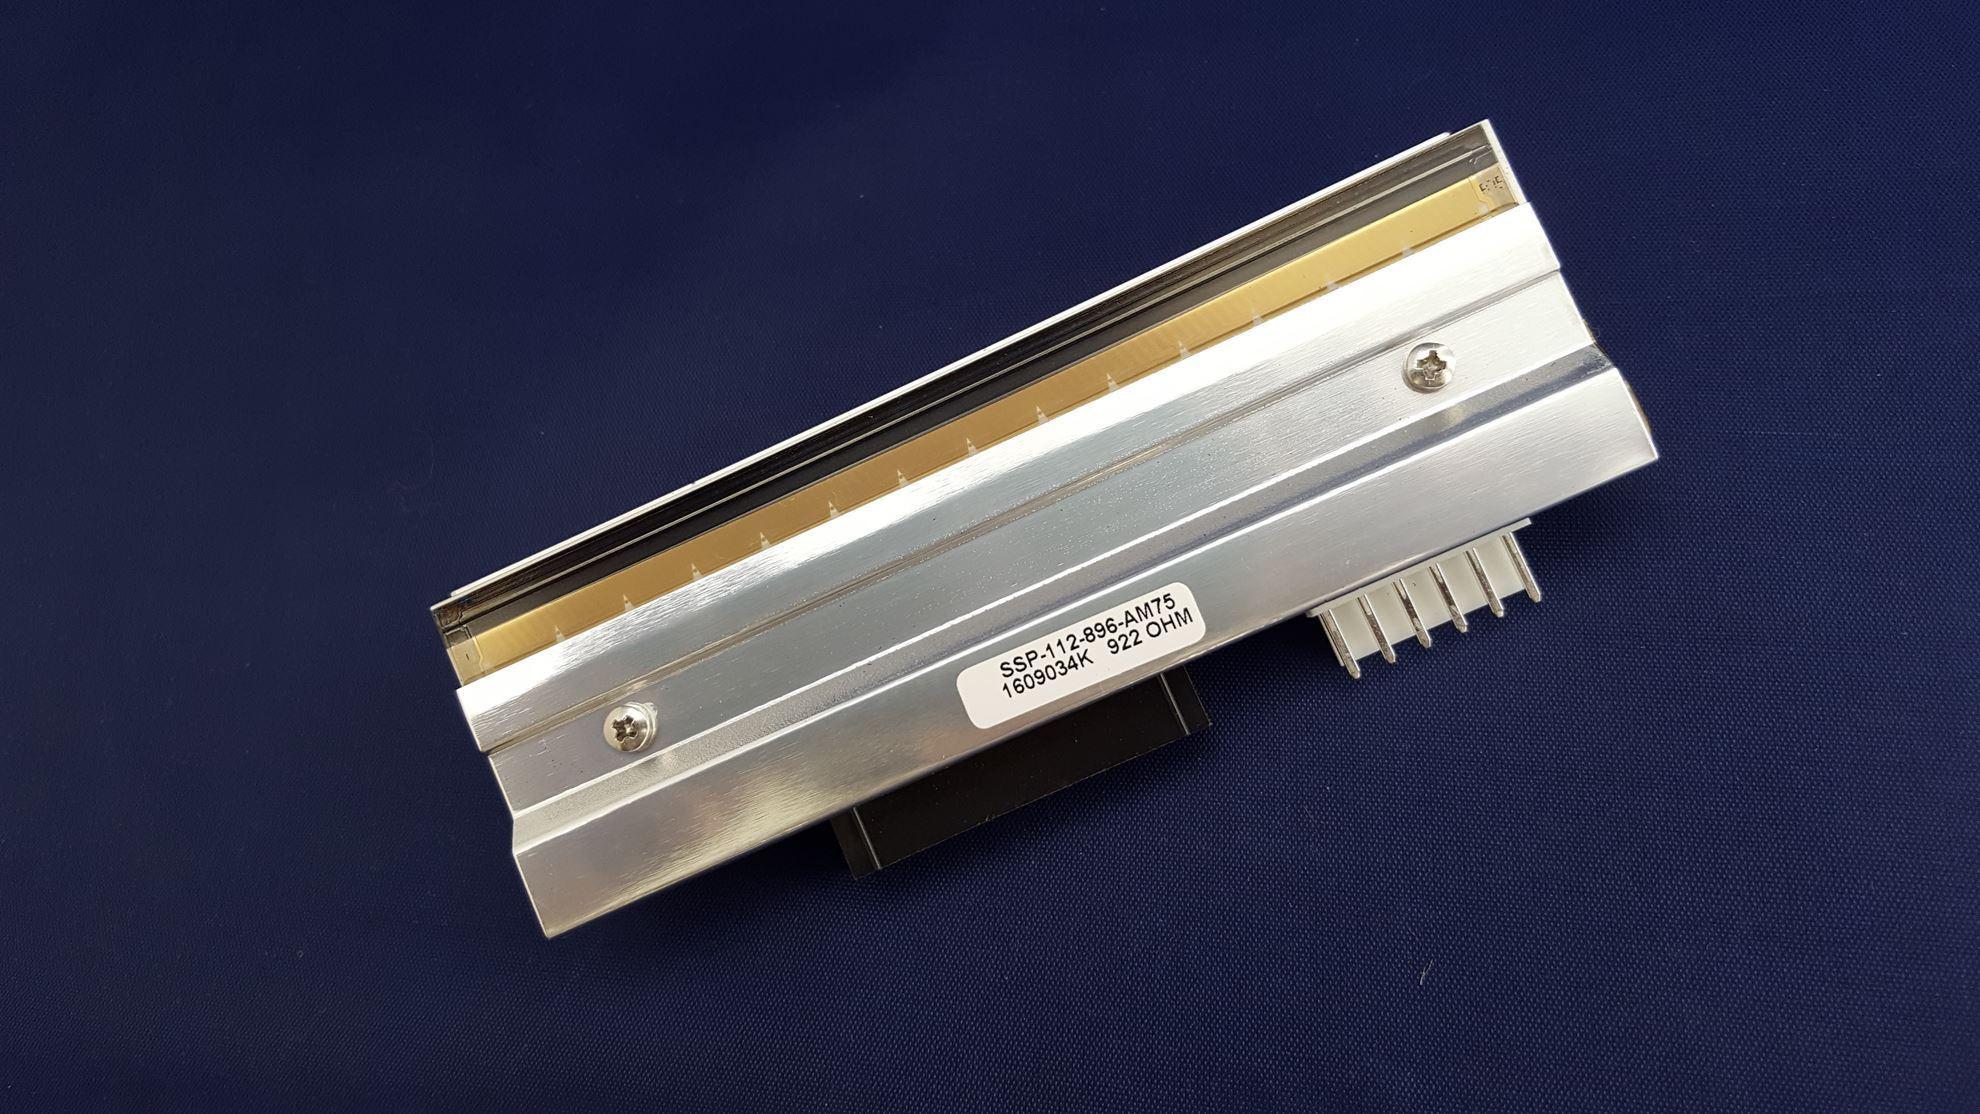 Sato SSP-112-896-AM75 WWM845800 OEM Compatible Printhead for Model M84PRO//PRO2